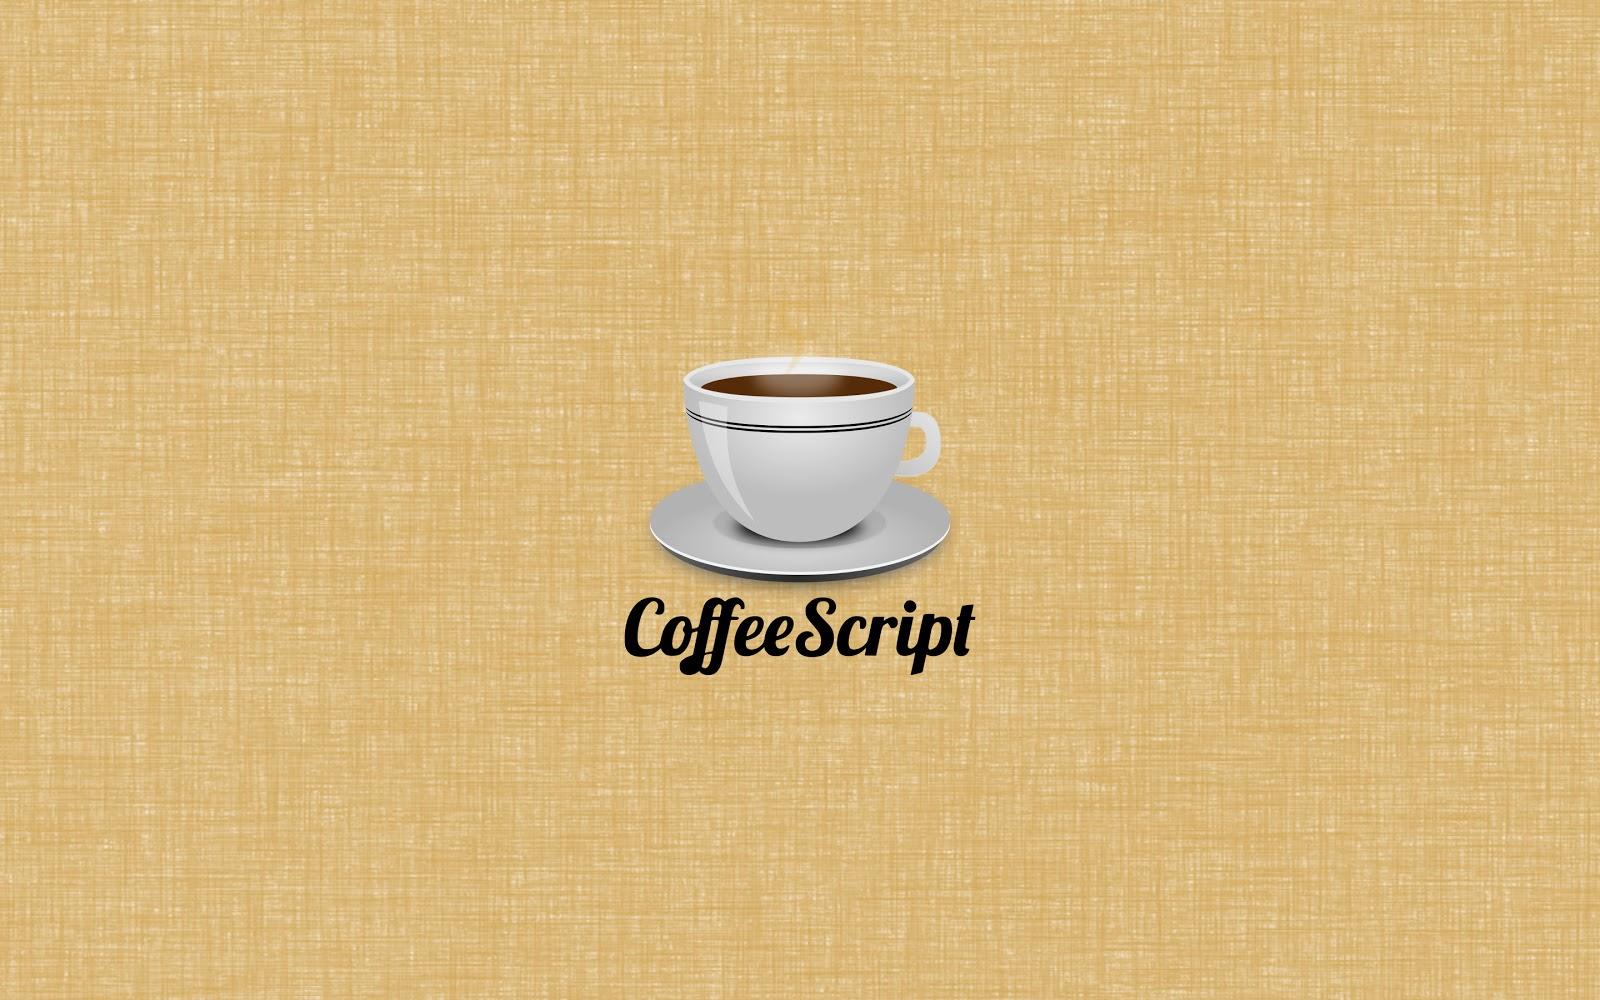 3 Free Programming Books to Learn CoffeeScript